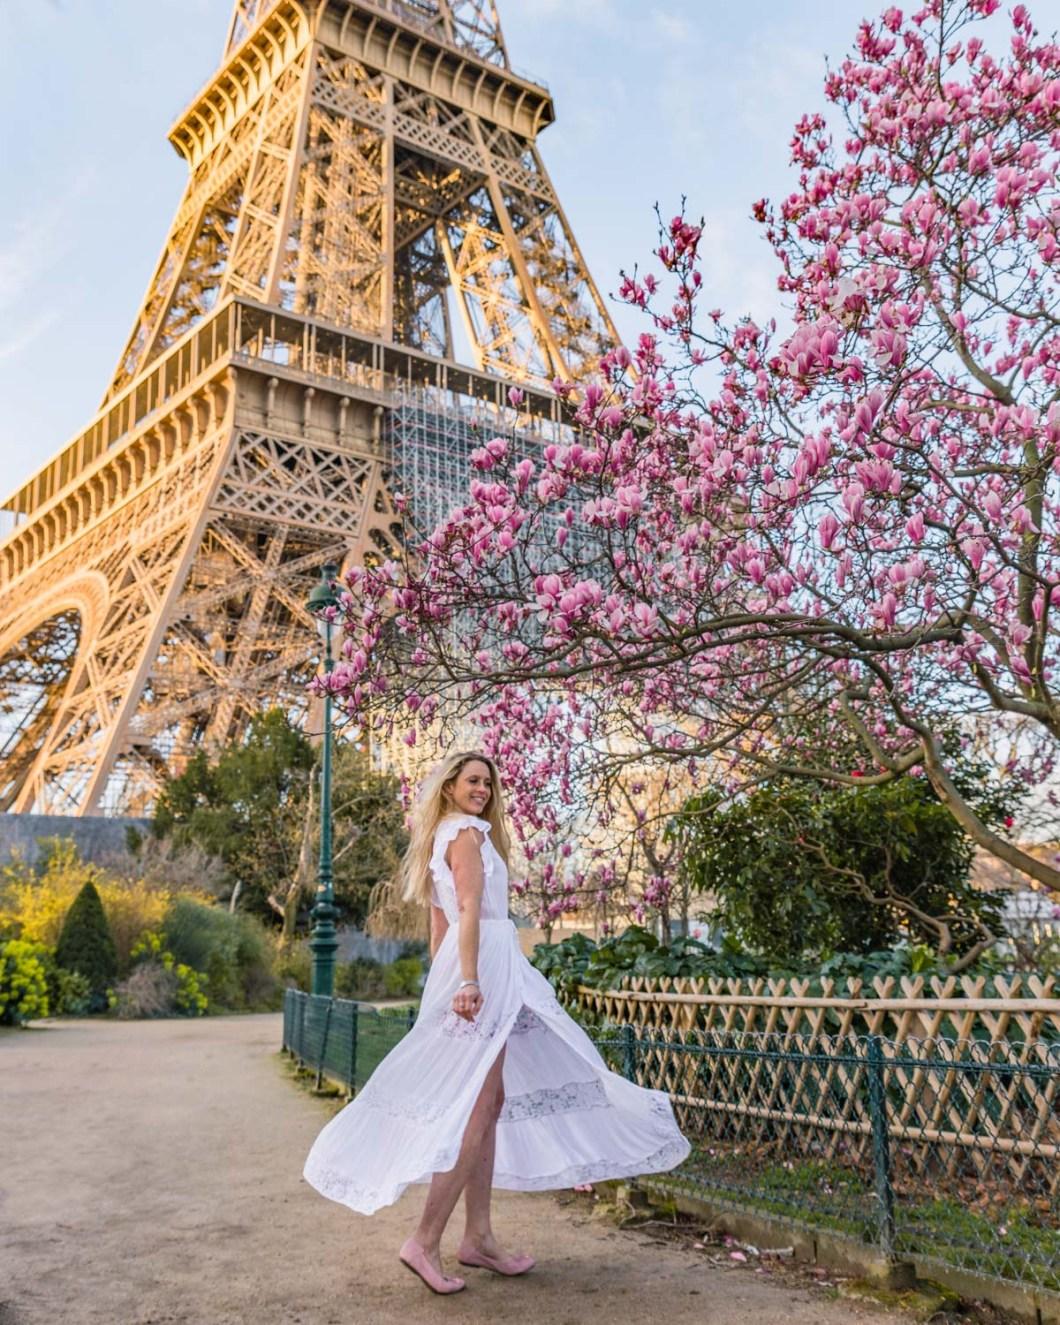 Magnolias in bloom at the Eiffel Tower - Paris